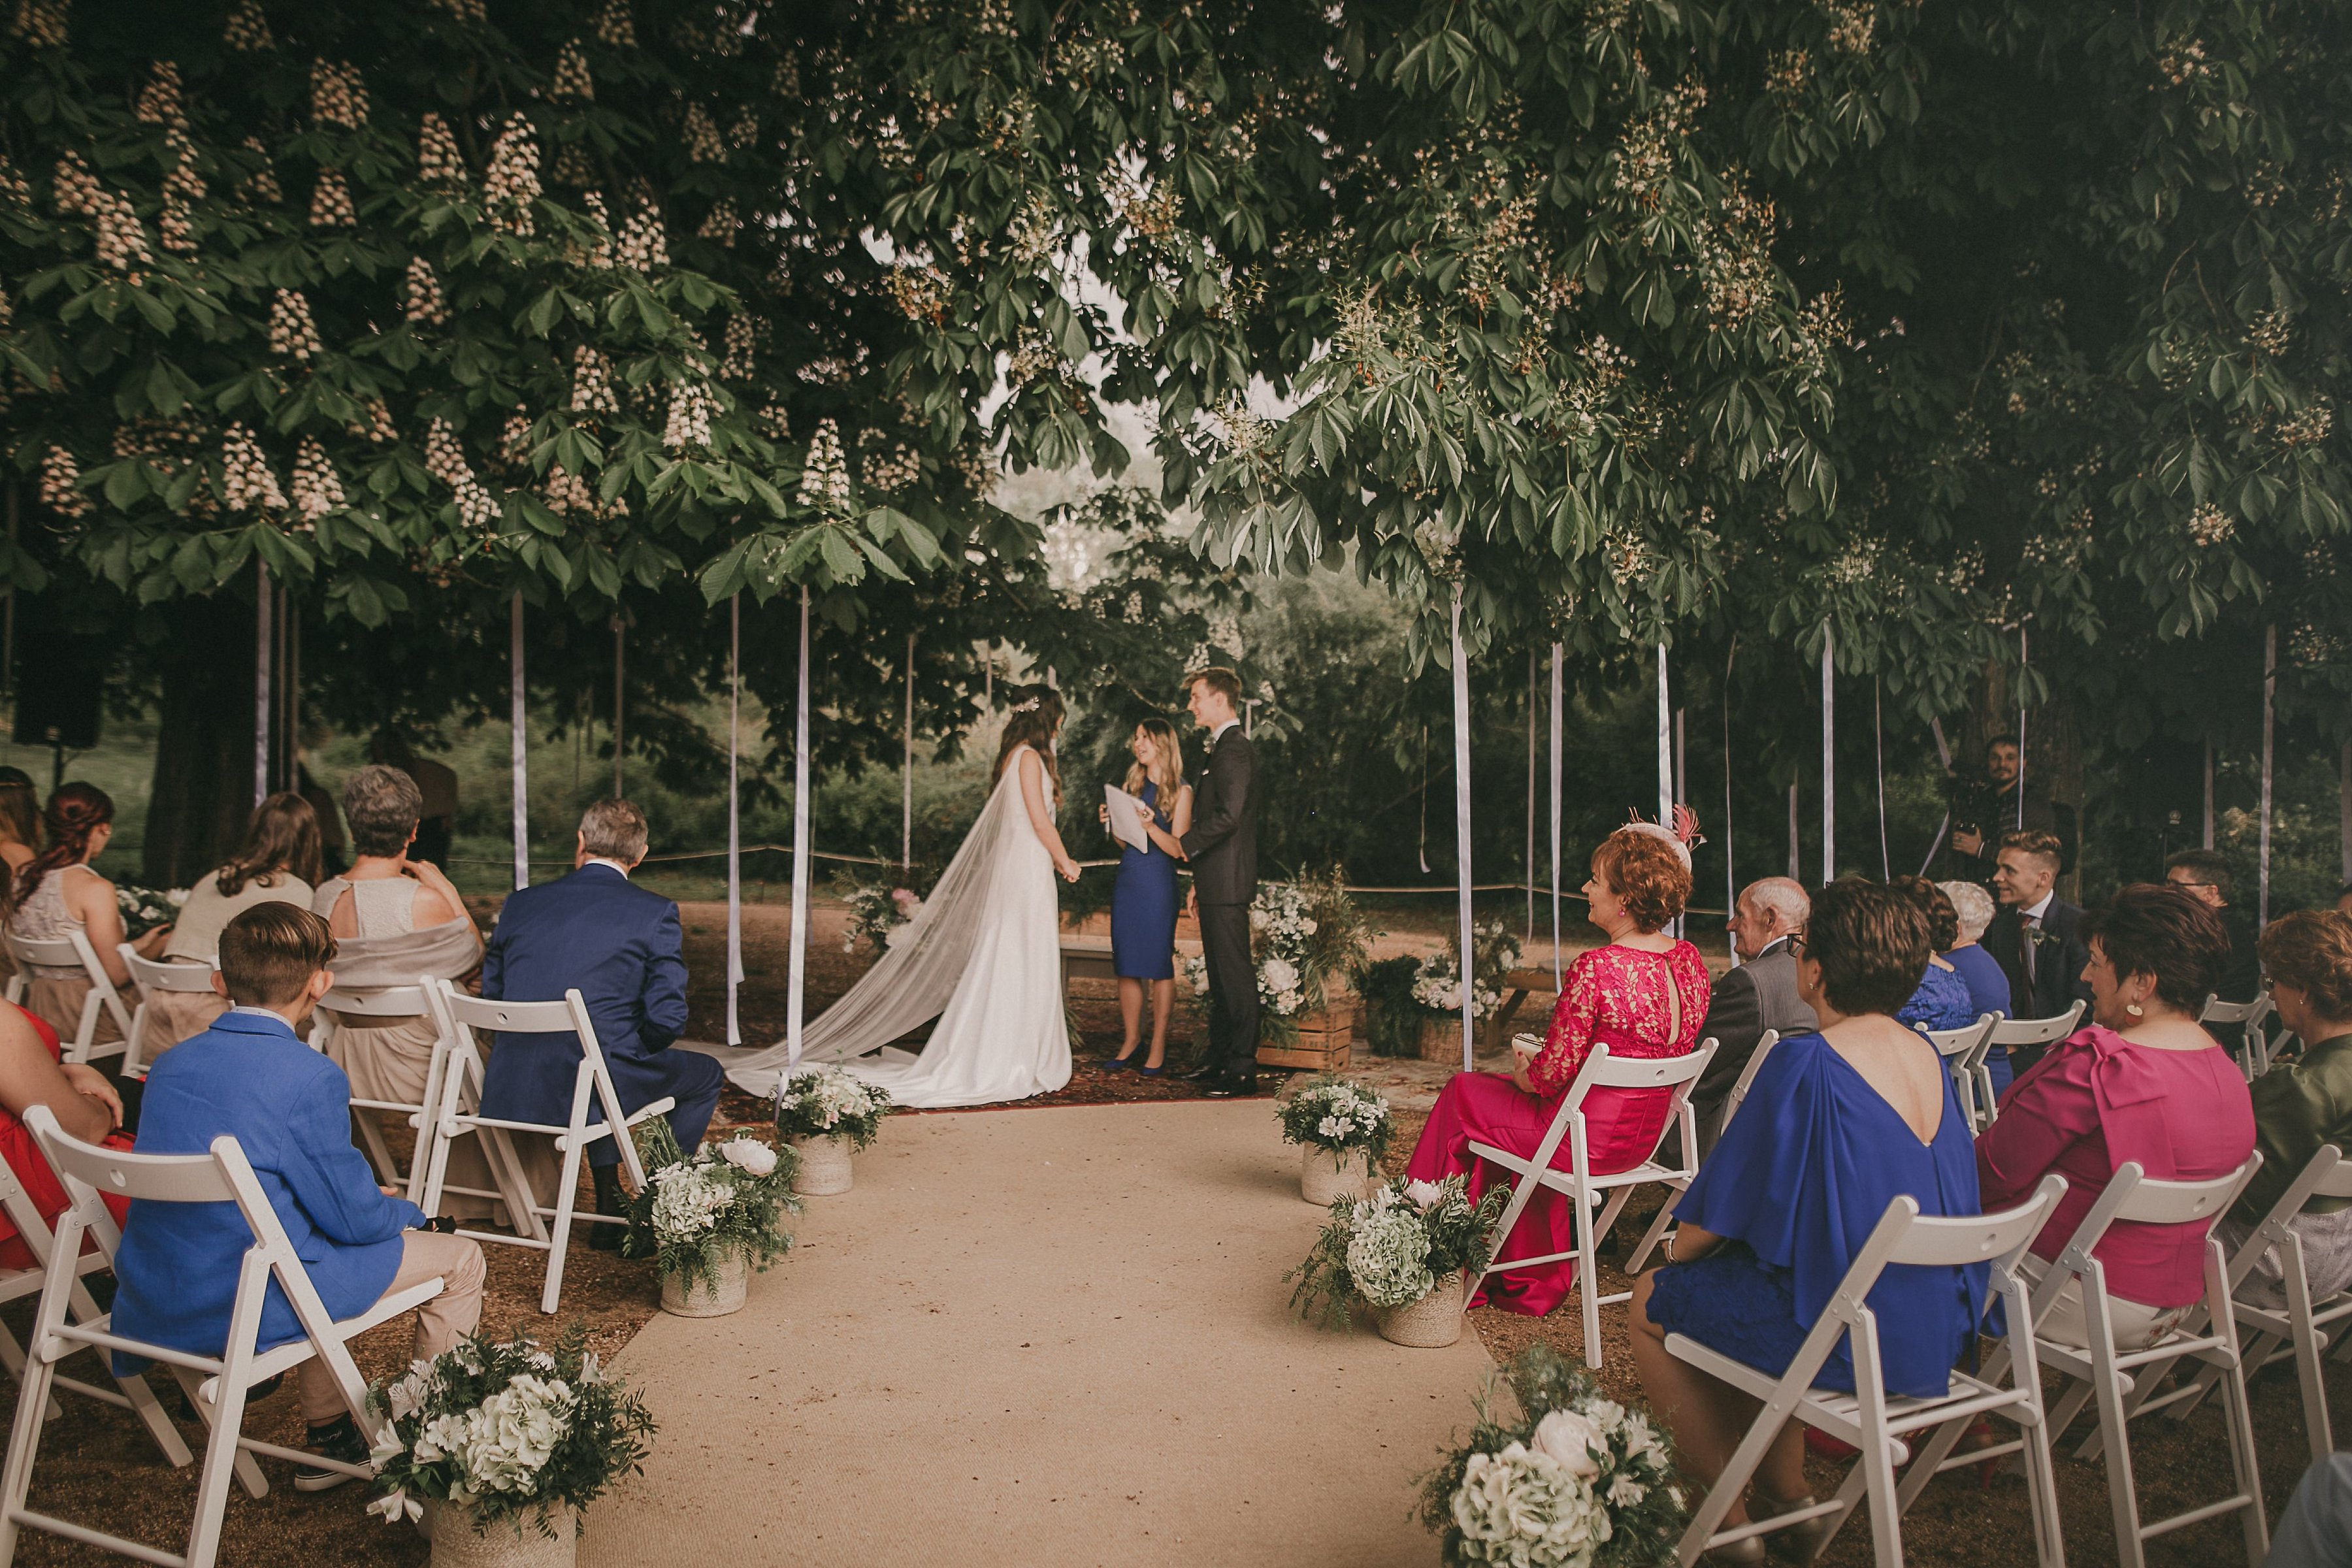 pablolaguiaana-diego-wedding-pablo-laguia-1601